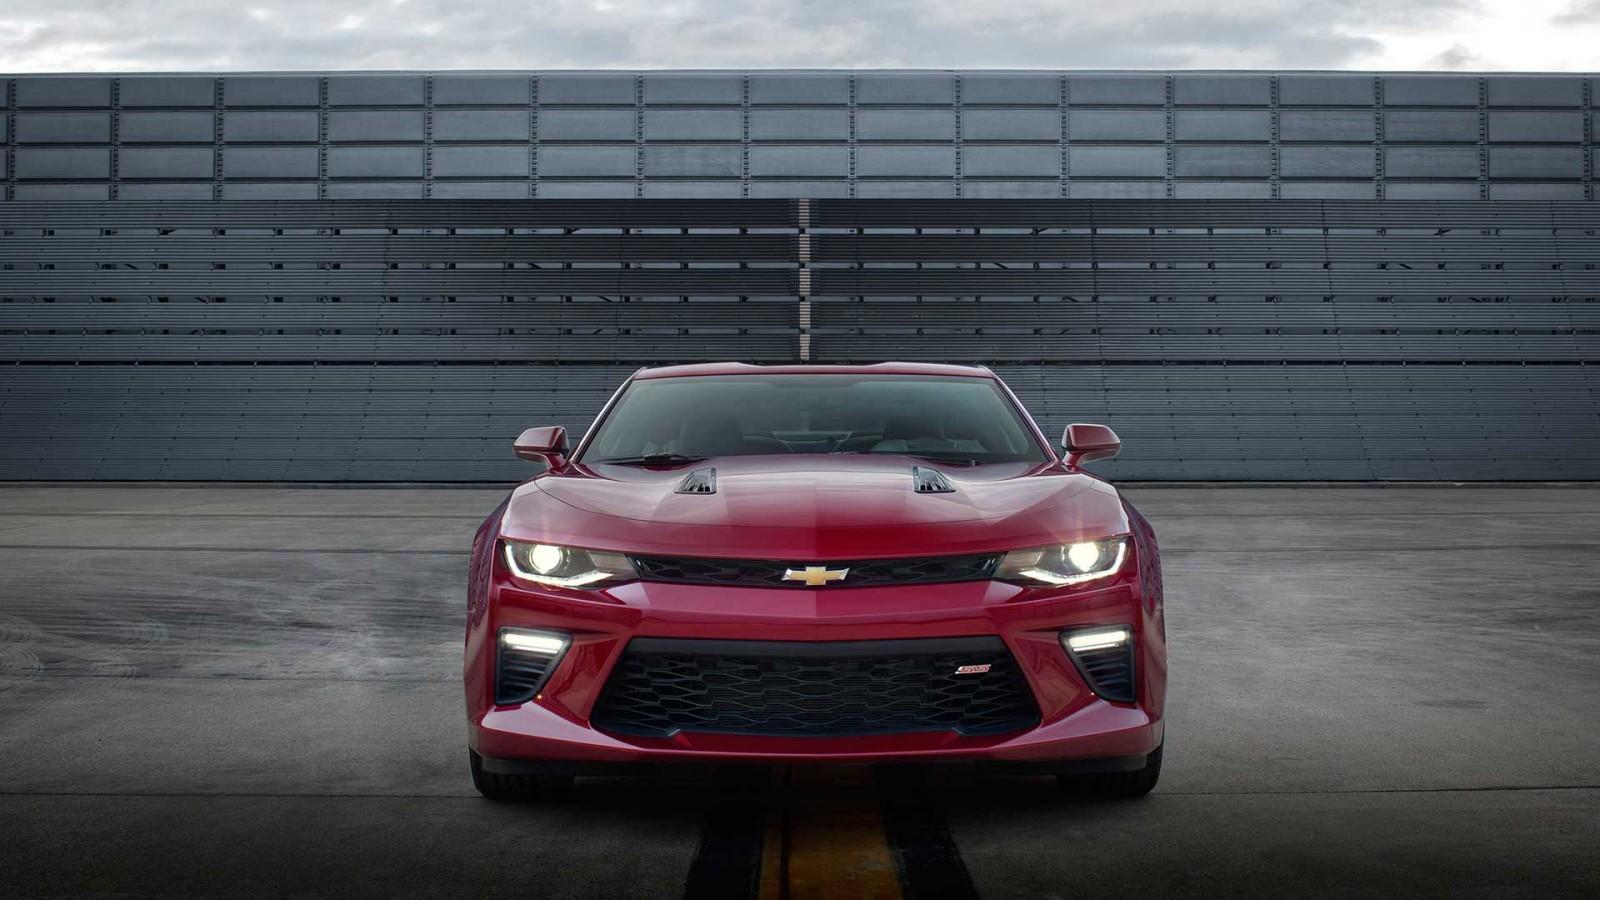 Chevrolet Camaro Lease Deals & Price | Jeff Wyler | Cincinnati OH